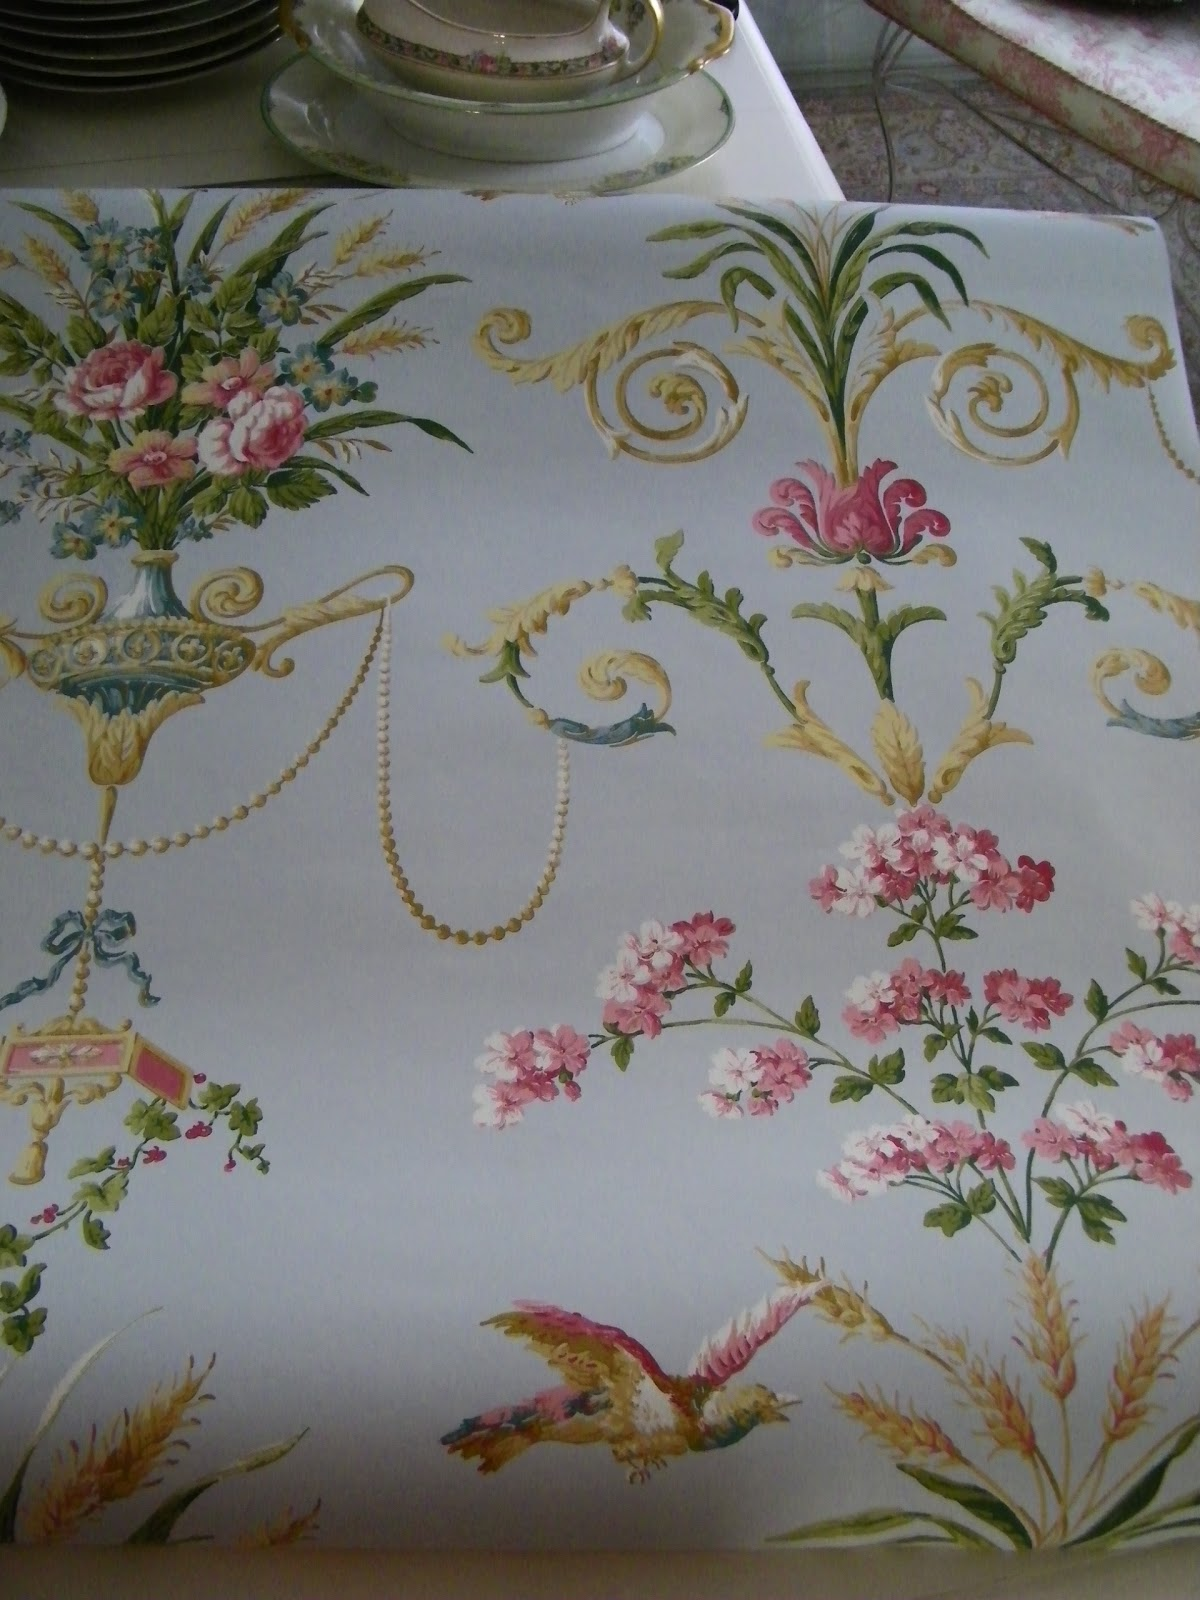 http://2.bp.blogspot.com/-WHNcOLOE4Sk/TZCcoGHM11I/AAAAAAAAEQM/Y1e6qNXk7tY/s1600/wallpaper+cabinet+035.JPG